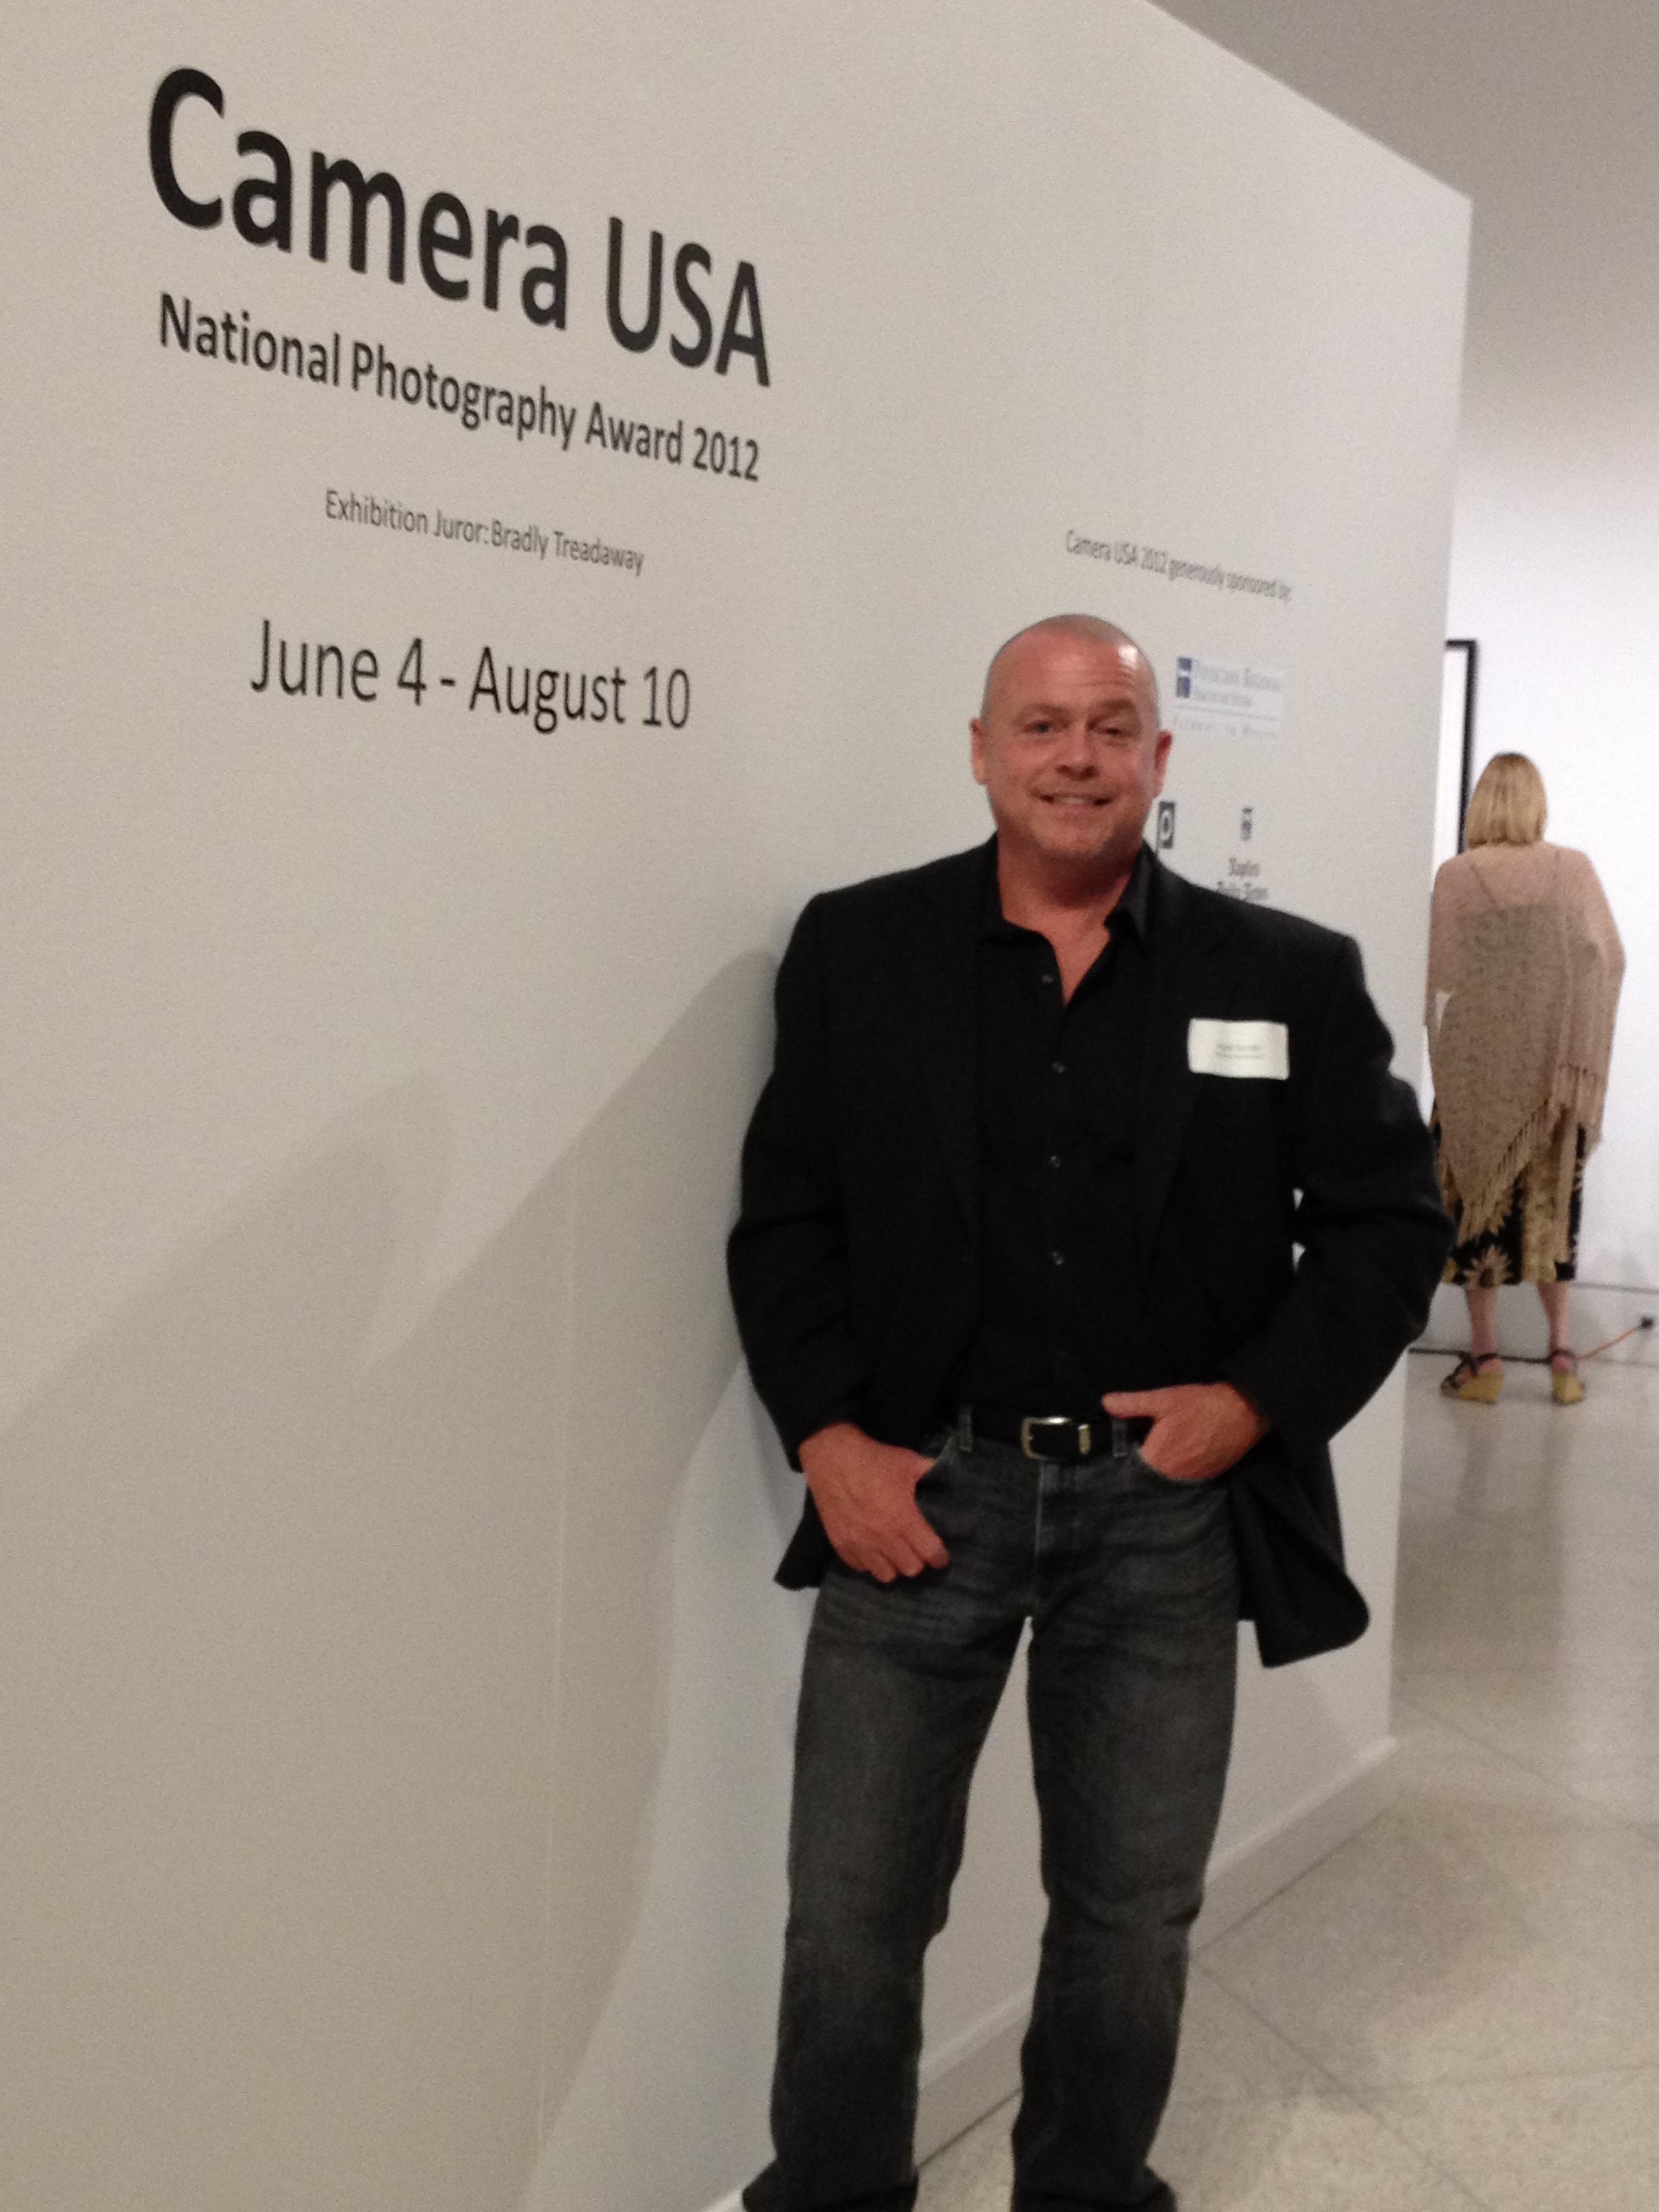 Camera USA: National Photography Award 2012, von Liebig Art Center, Naples, Florida - June 4 to August 10, 2012